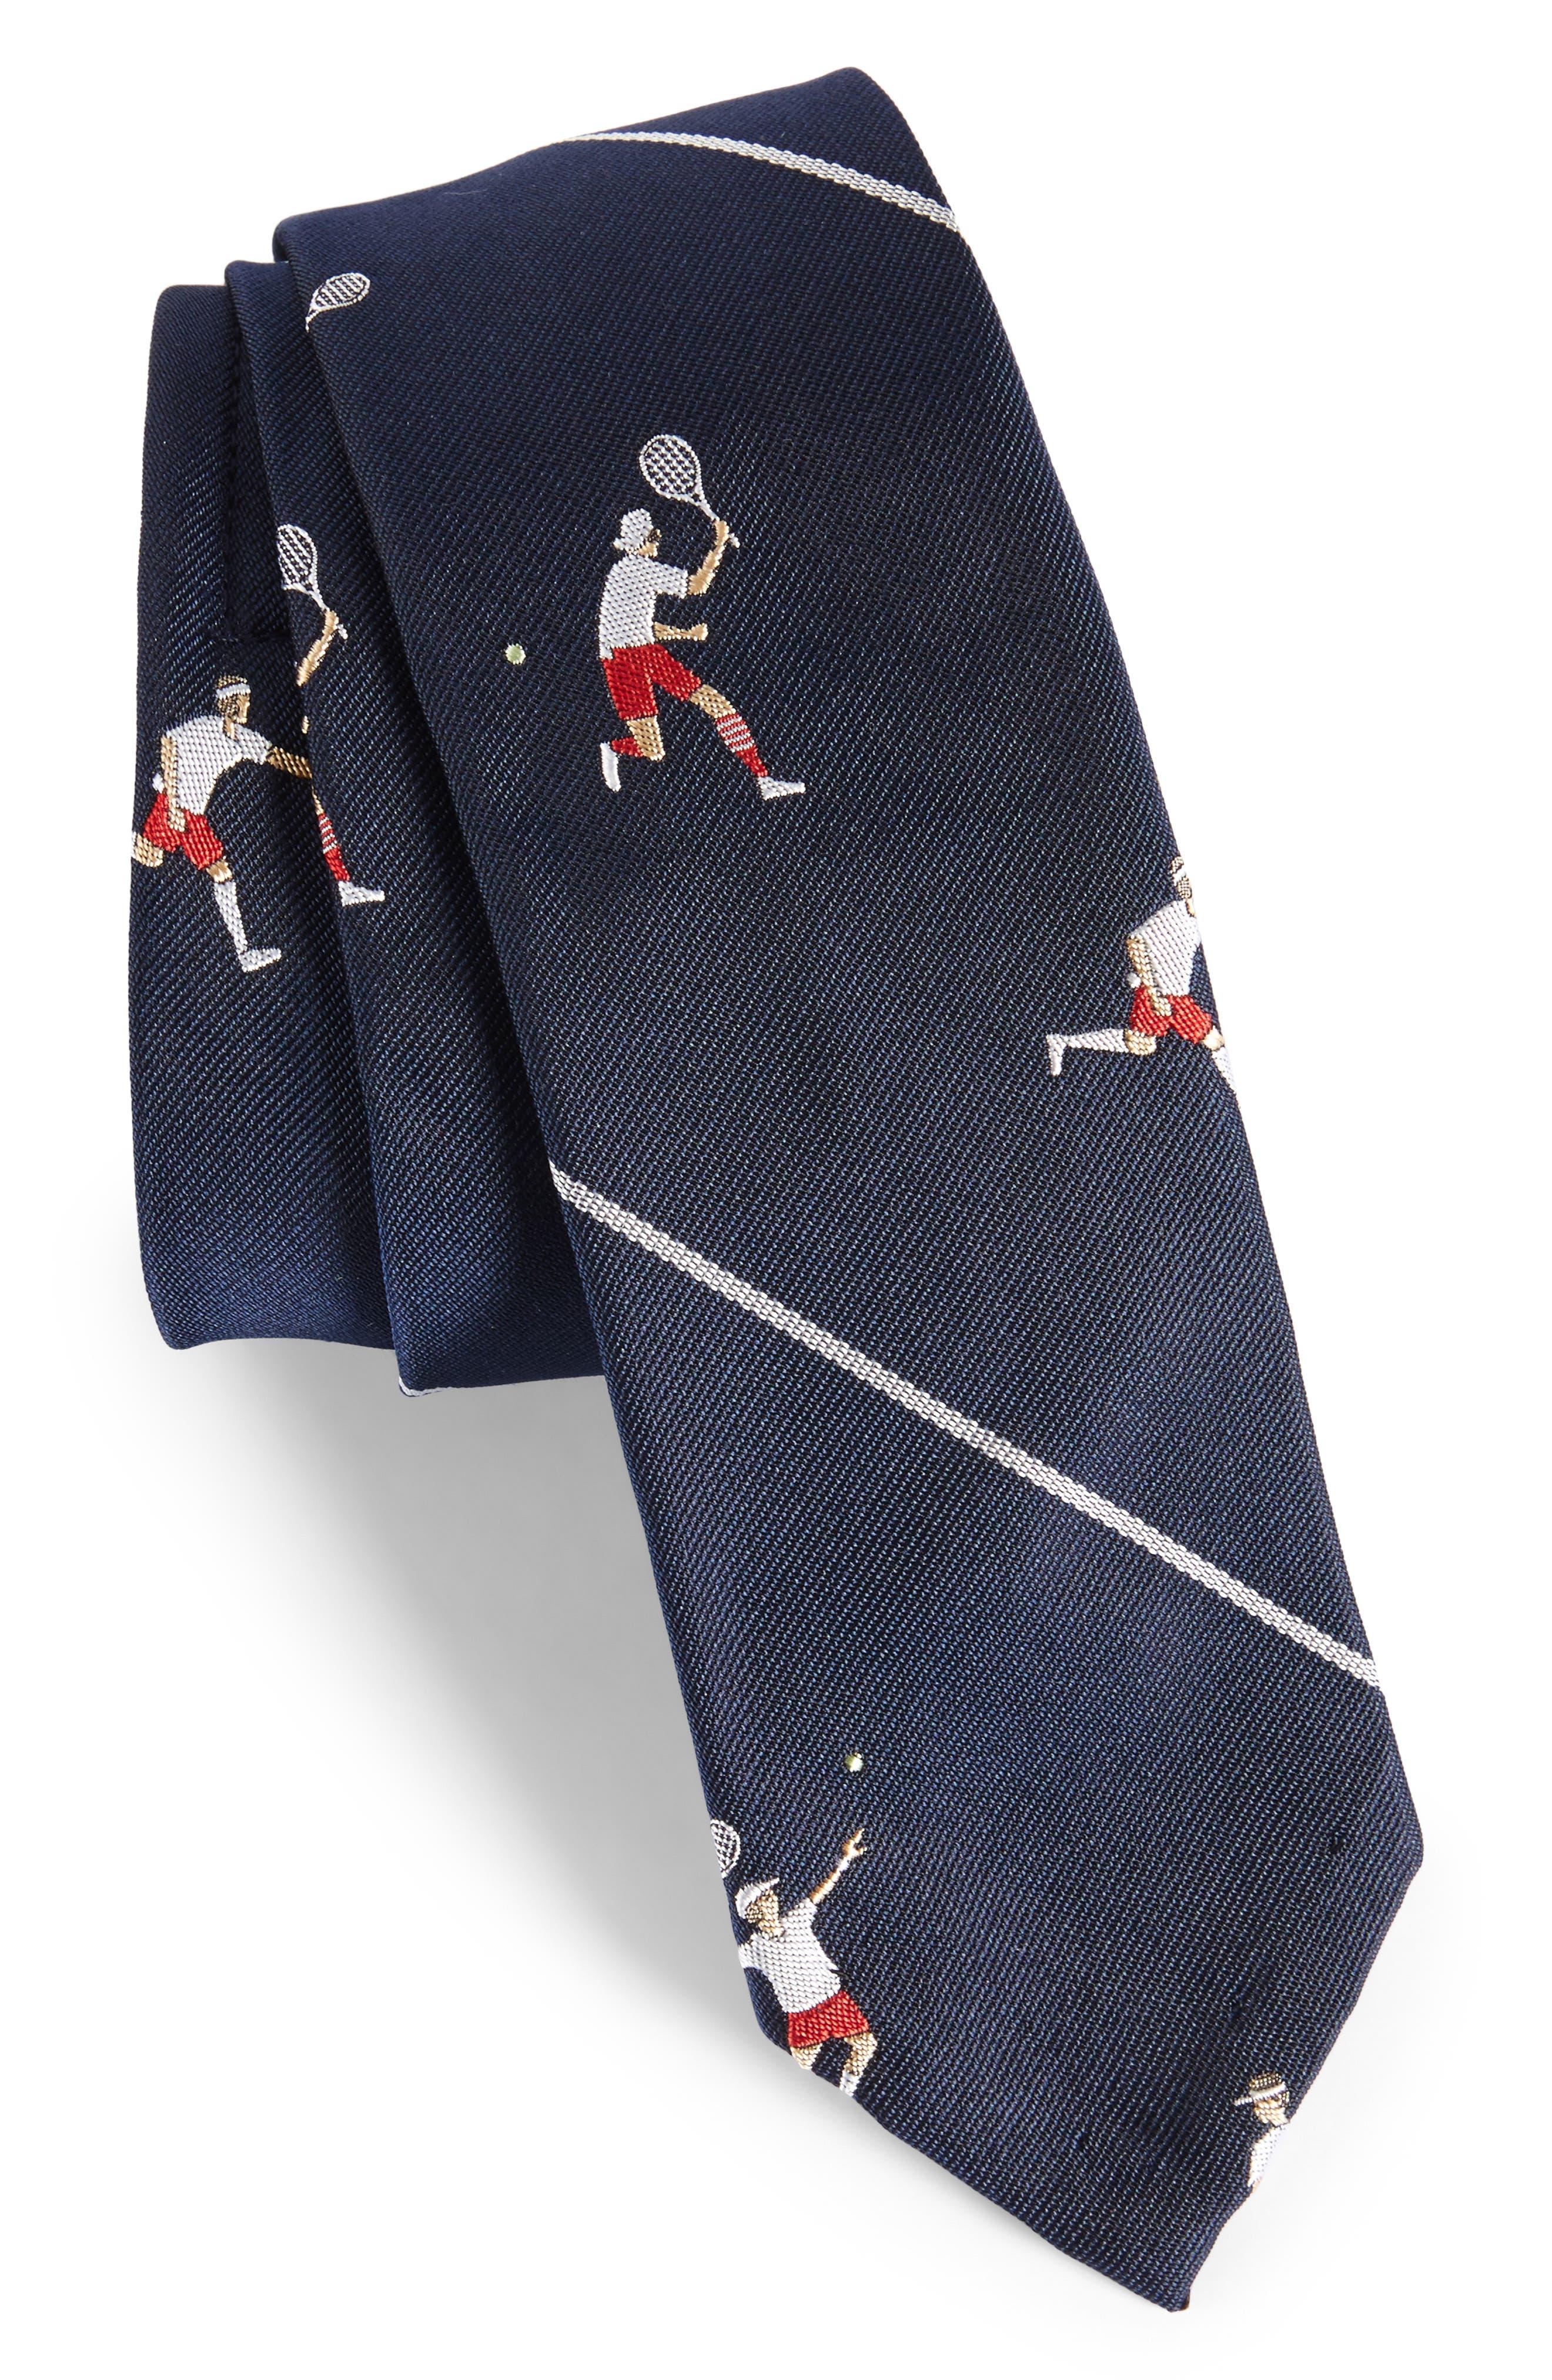 Main Image - Thom Browne Tennis Player Silk Skinny Tie